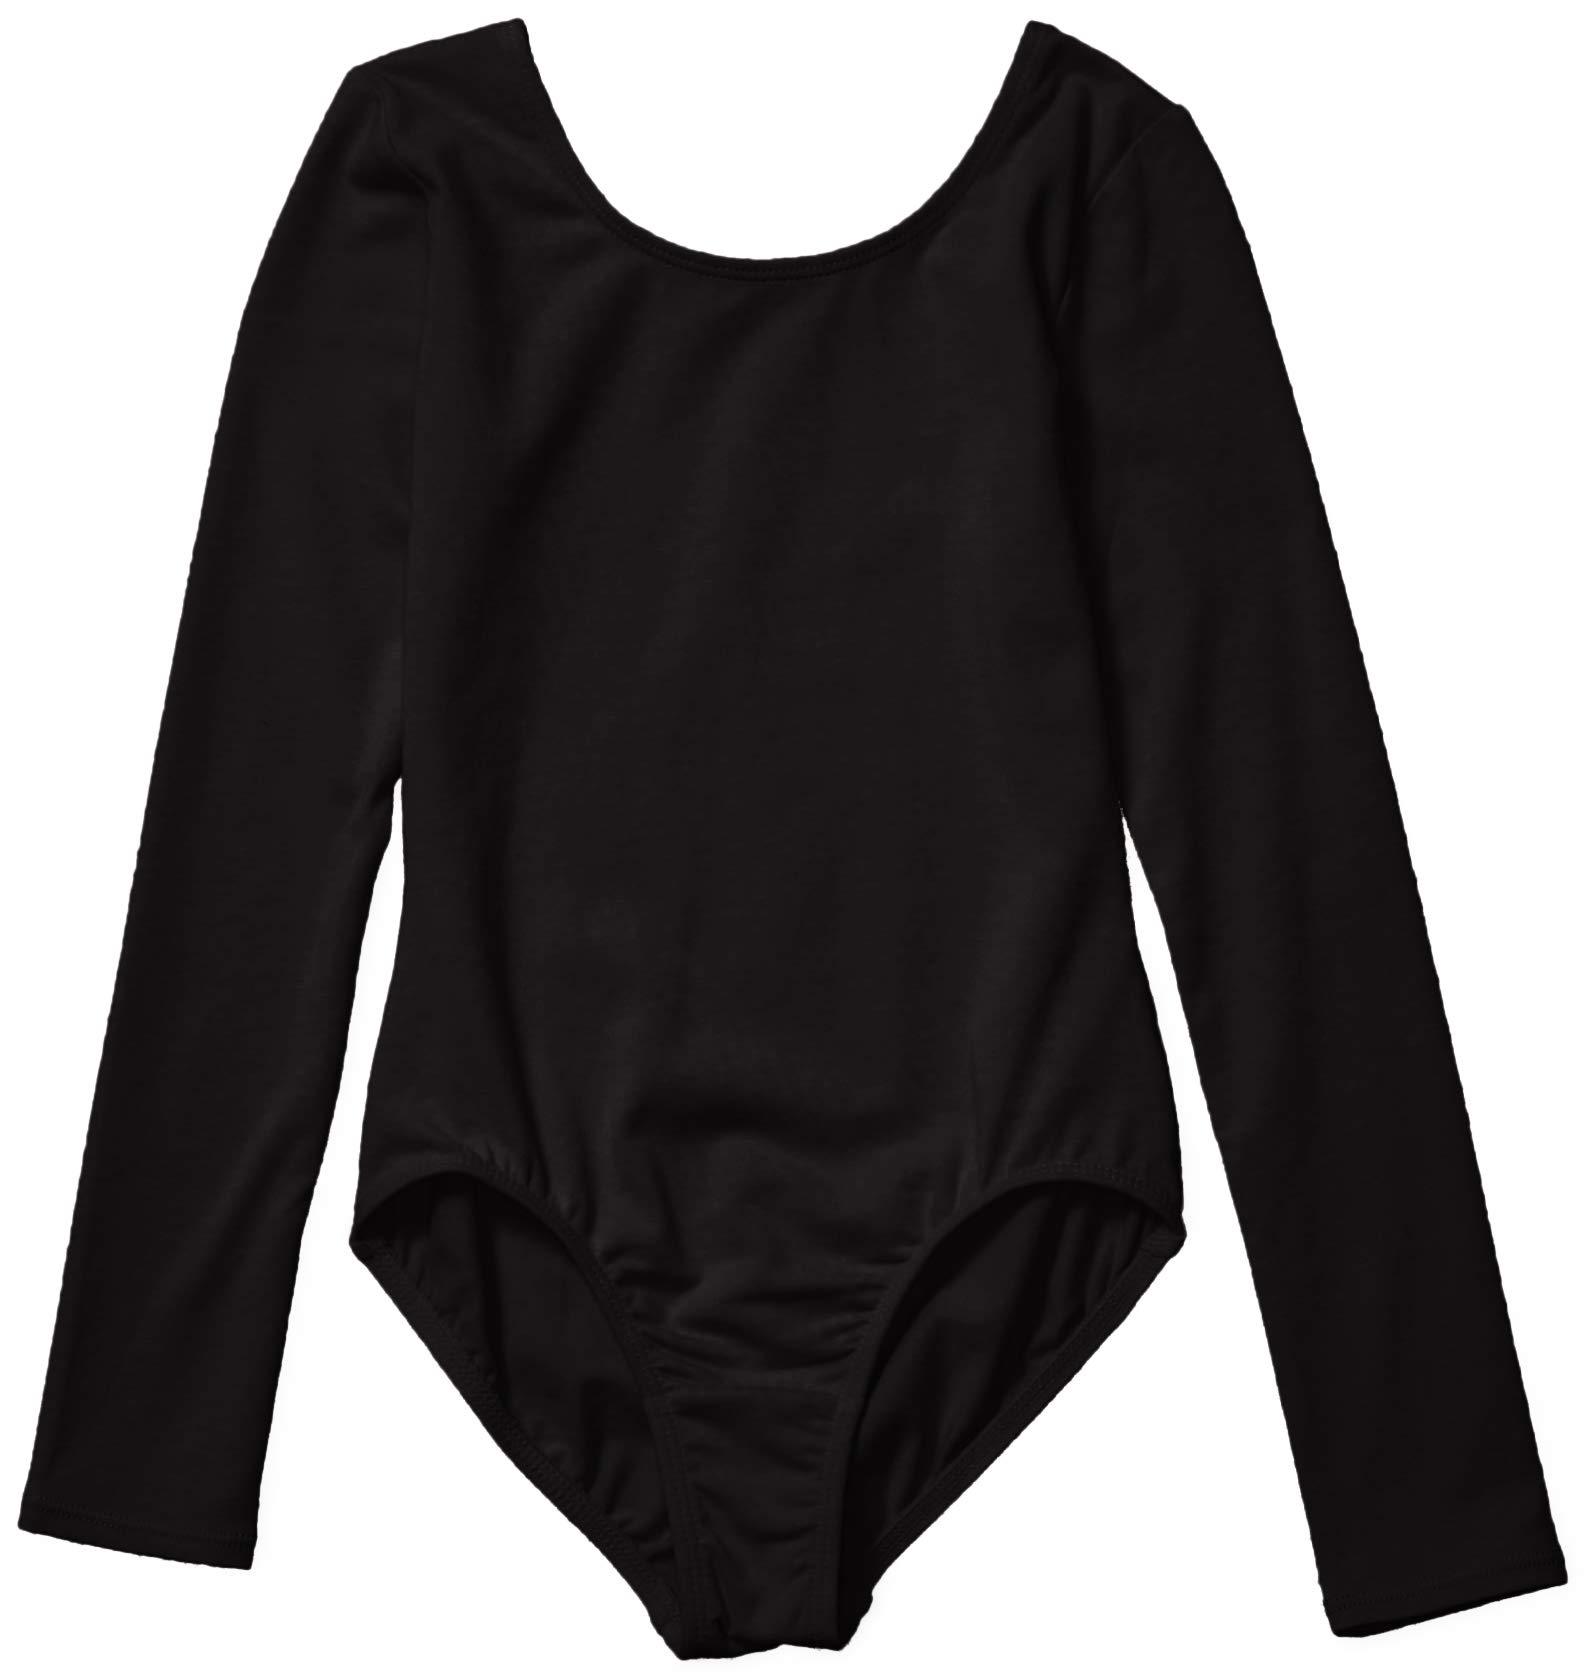 Amazon Essentials Girls Long Sleeve Dance Leotard Black Small